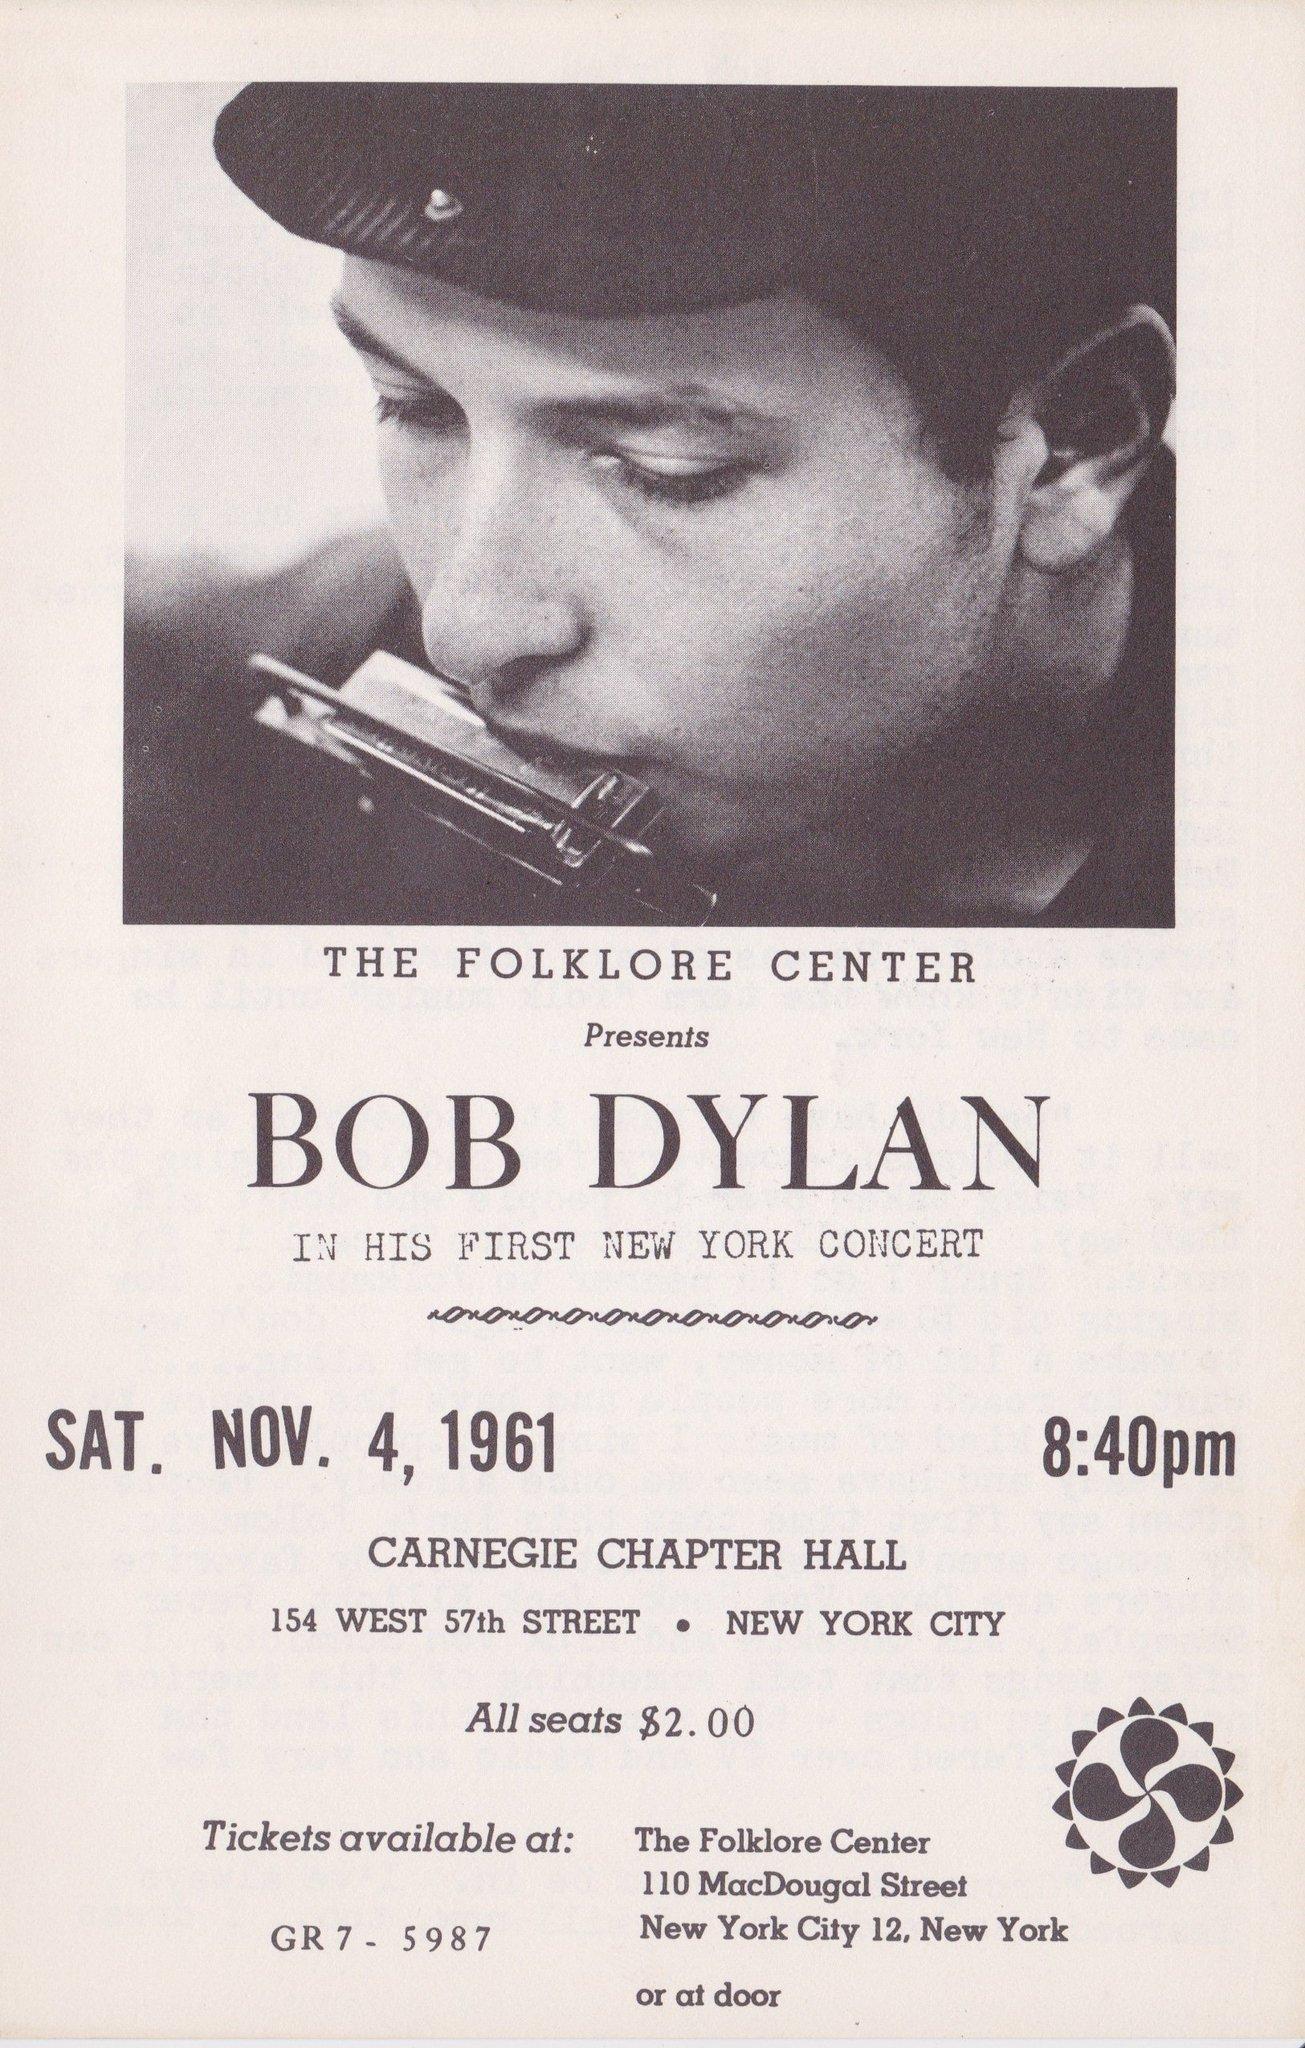 Bob Dylan Nobel Prize winner.